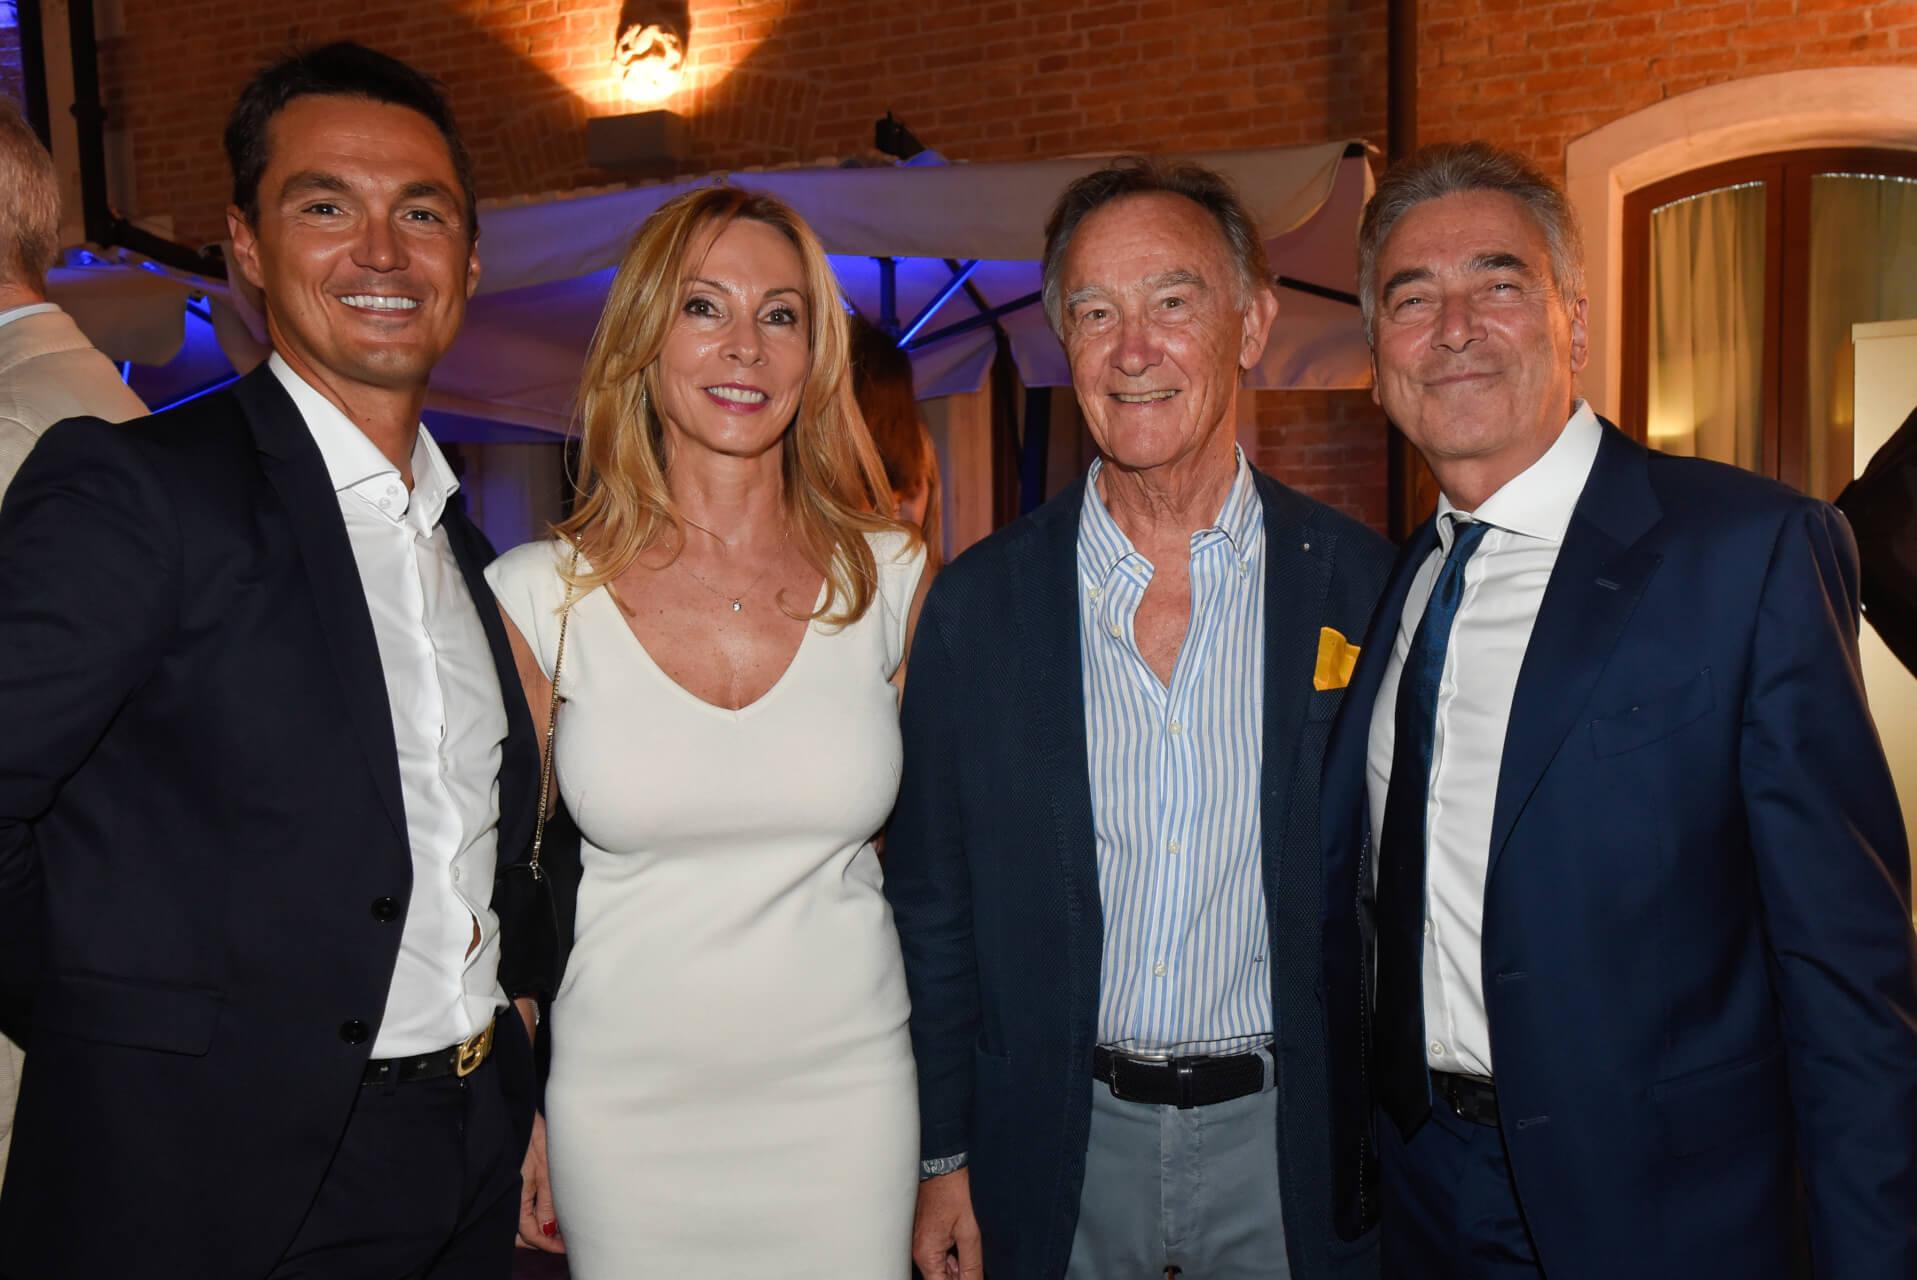 Michele Cattadori, Marina Corradin, Antonio Simionato, leonardo Isaia